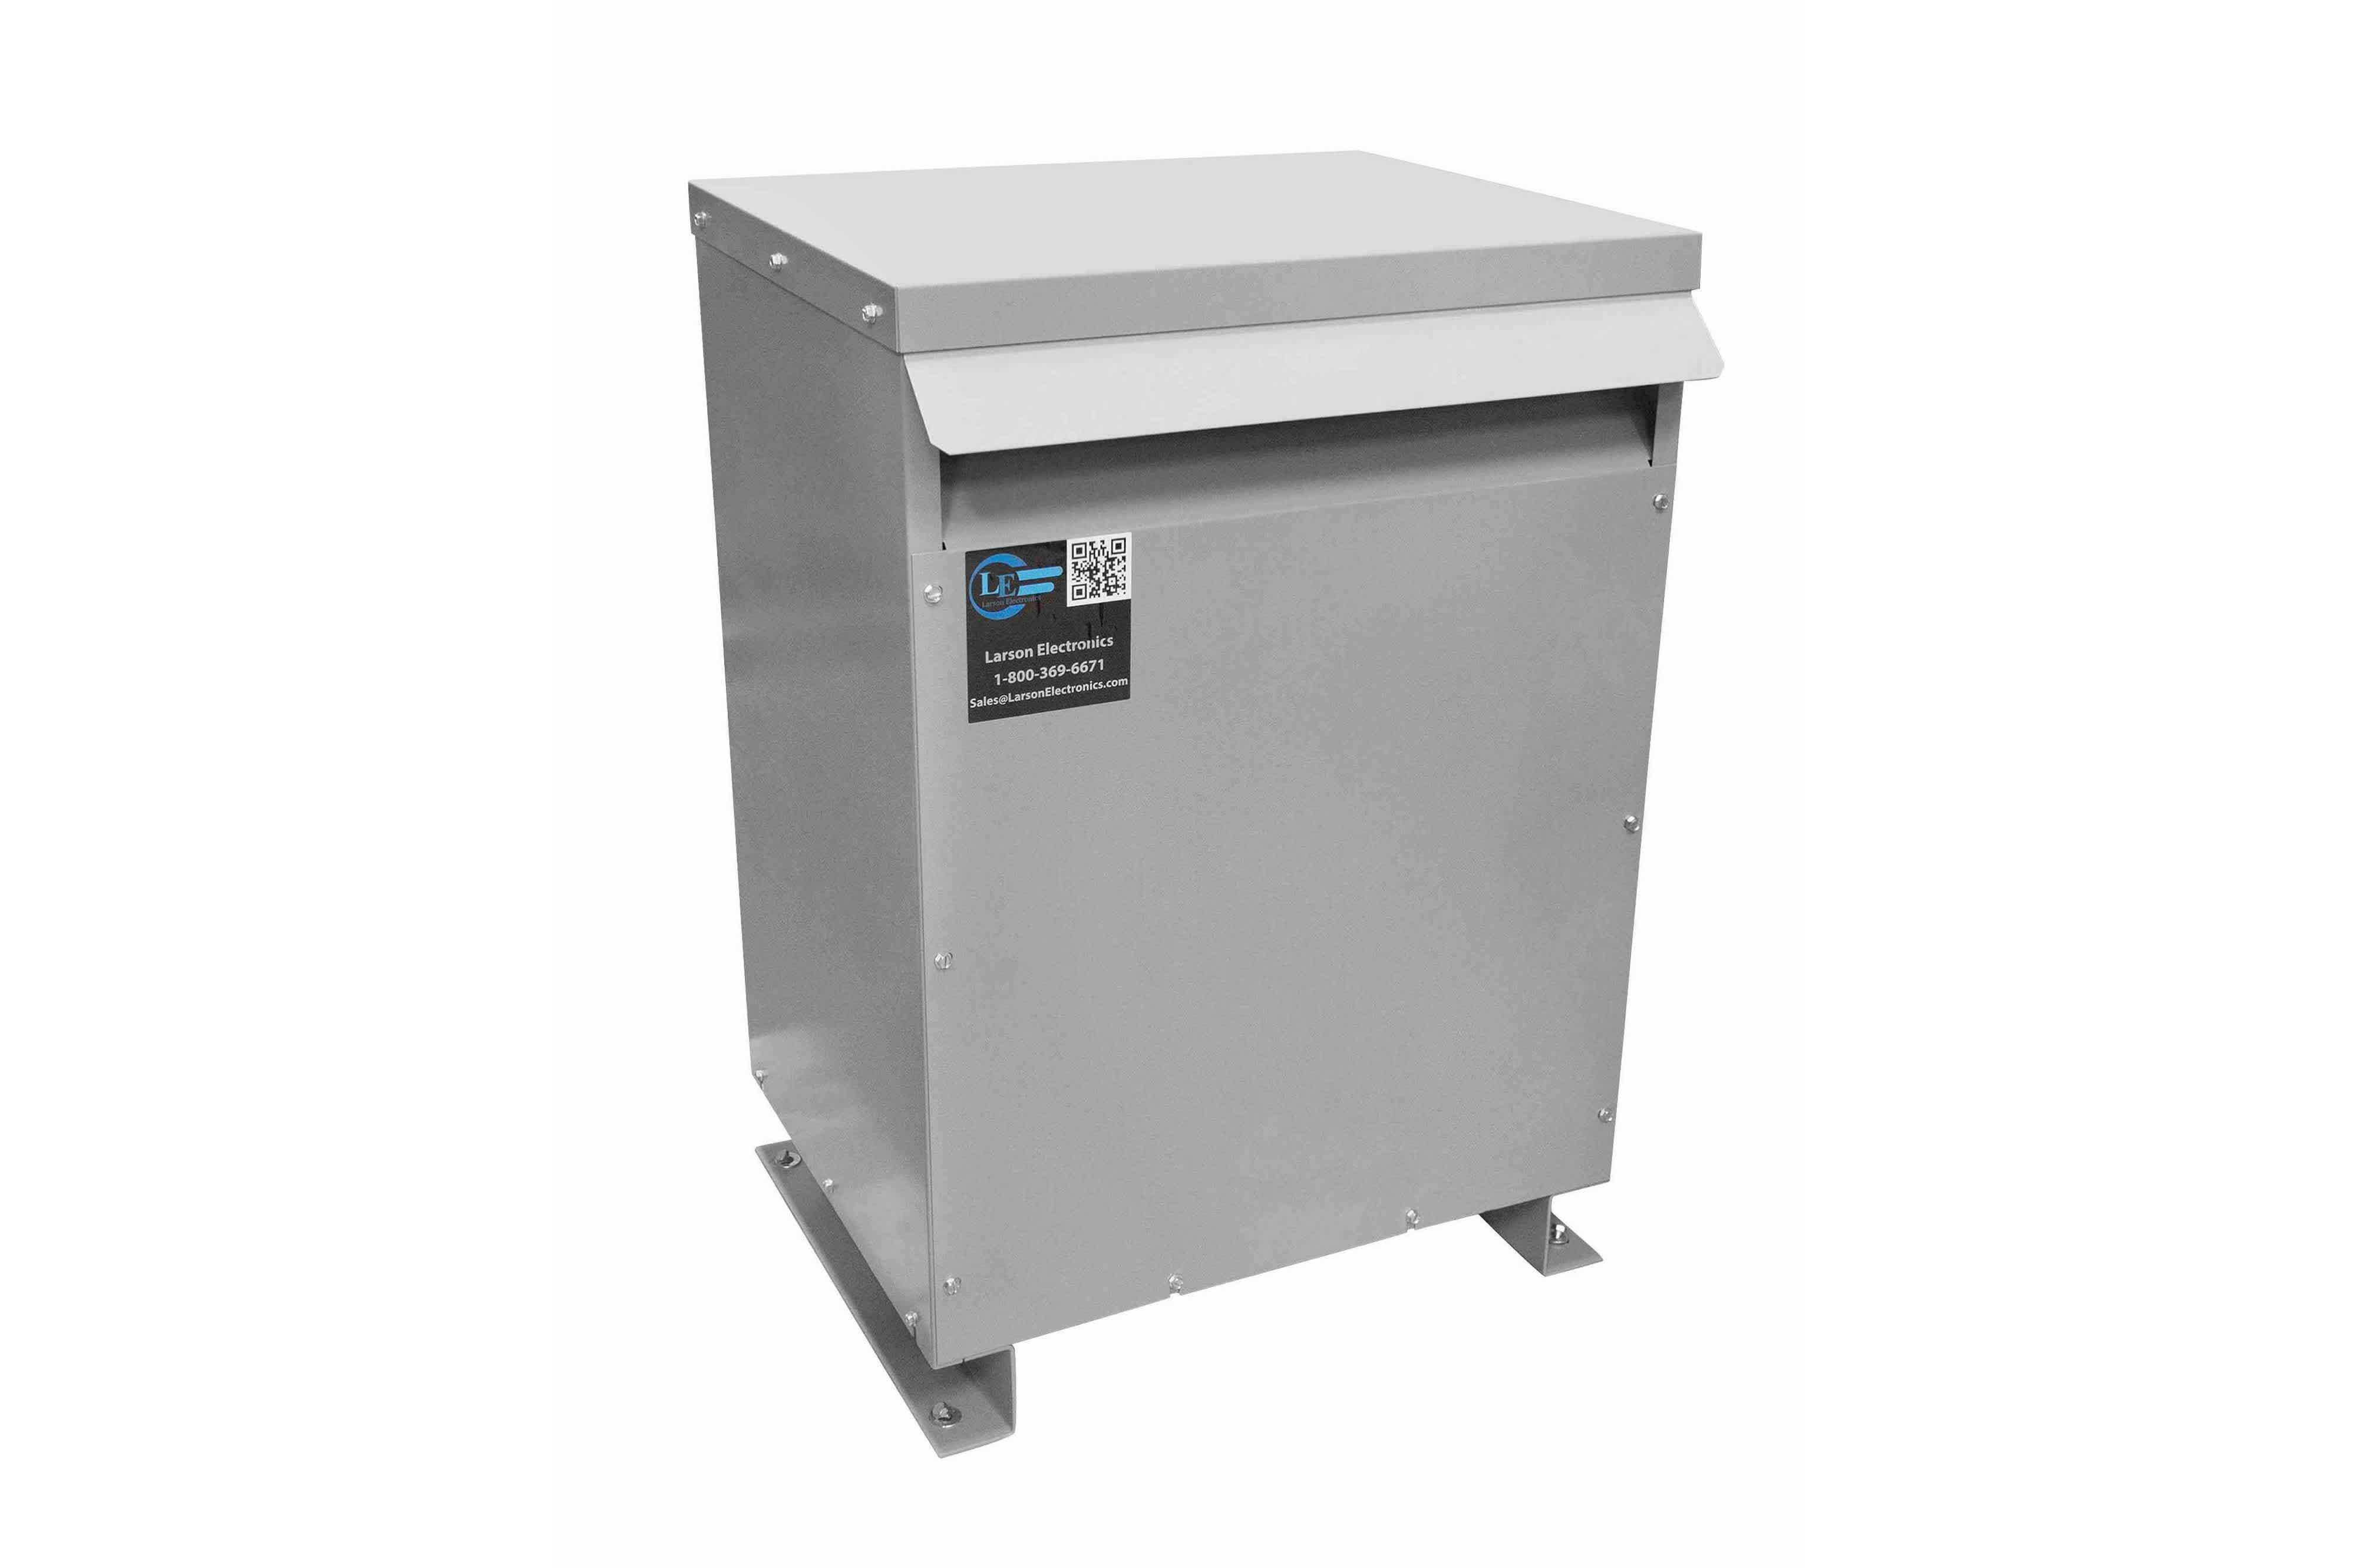 200 kVA 3PH Isolation Transformer, 600V Wye Primary, 380V Delta Secondary, N3R, Ventilated, 60 Hz